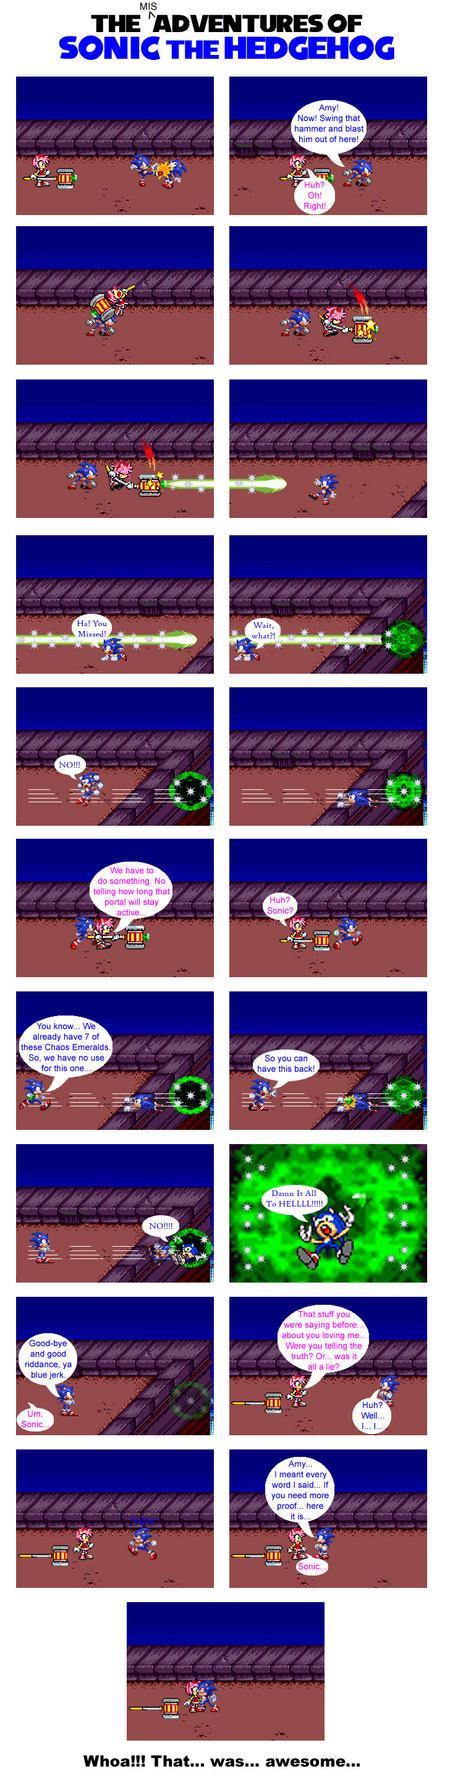 Sonic's Double Trouble - 211 by FallenAngelCam7